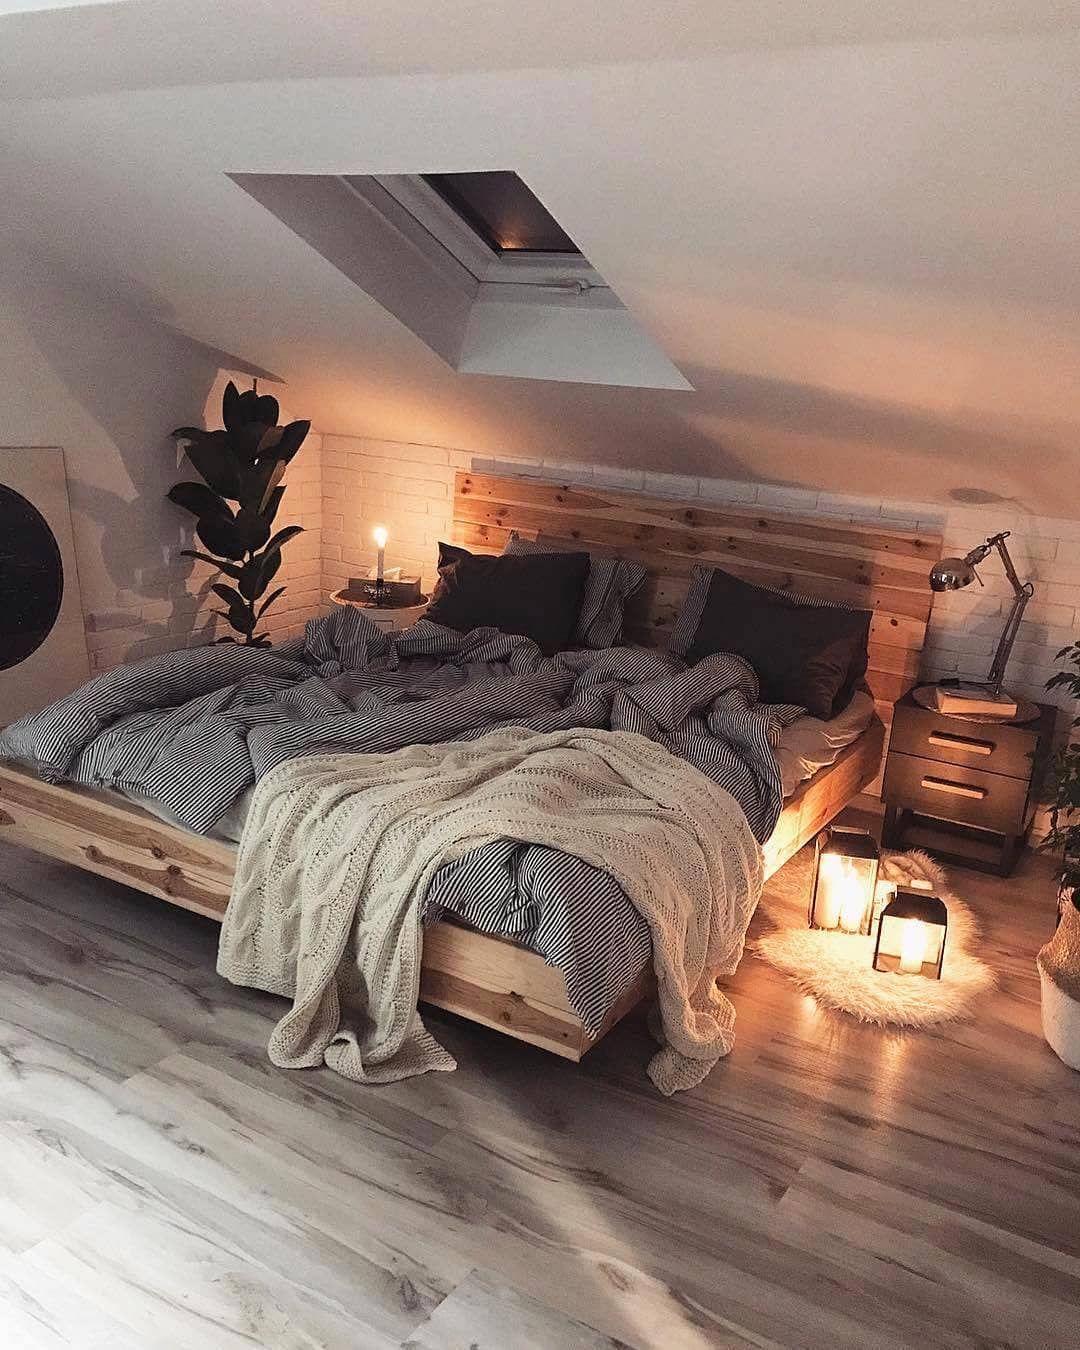 "Interior Design & Decor on Instagram: ""Attic Bedroom by @nasze.poddasze / Poland 😍  #bedroom #bed #cozy #decor #design #interior #interiors #interiordesign"""